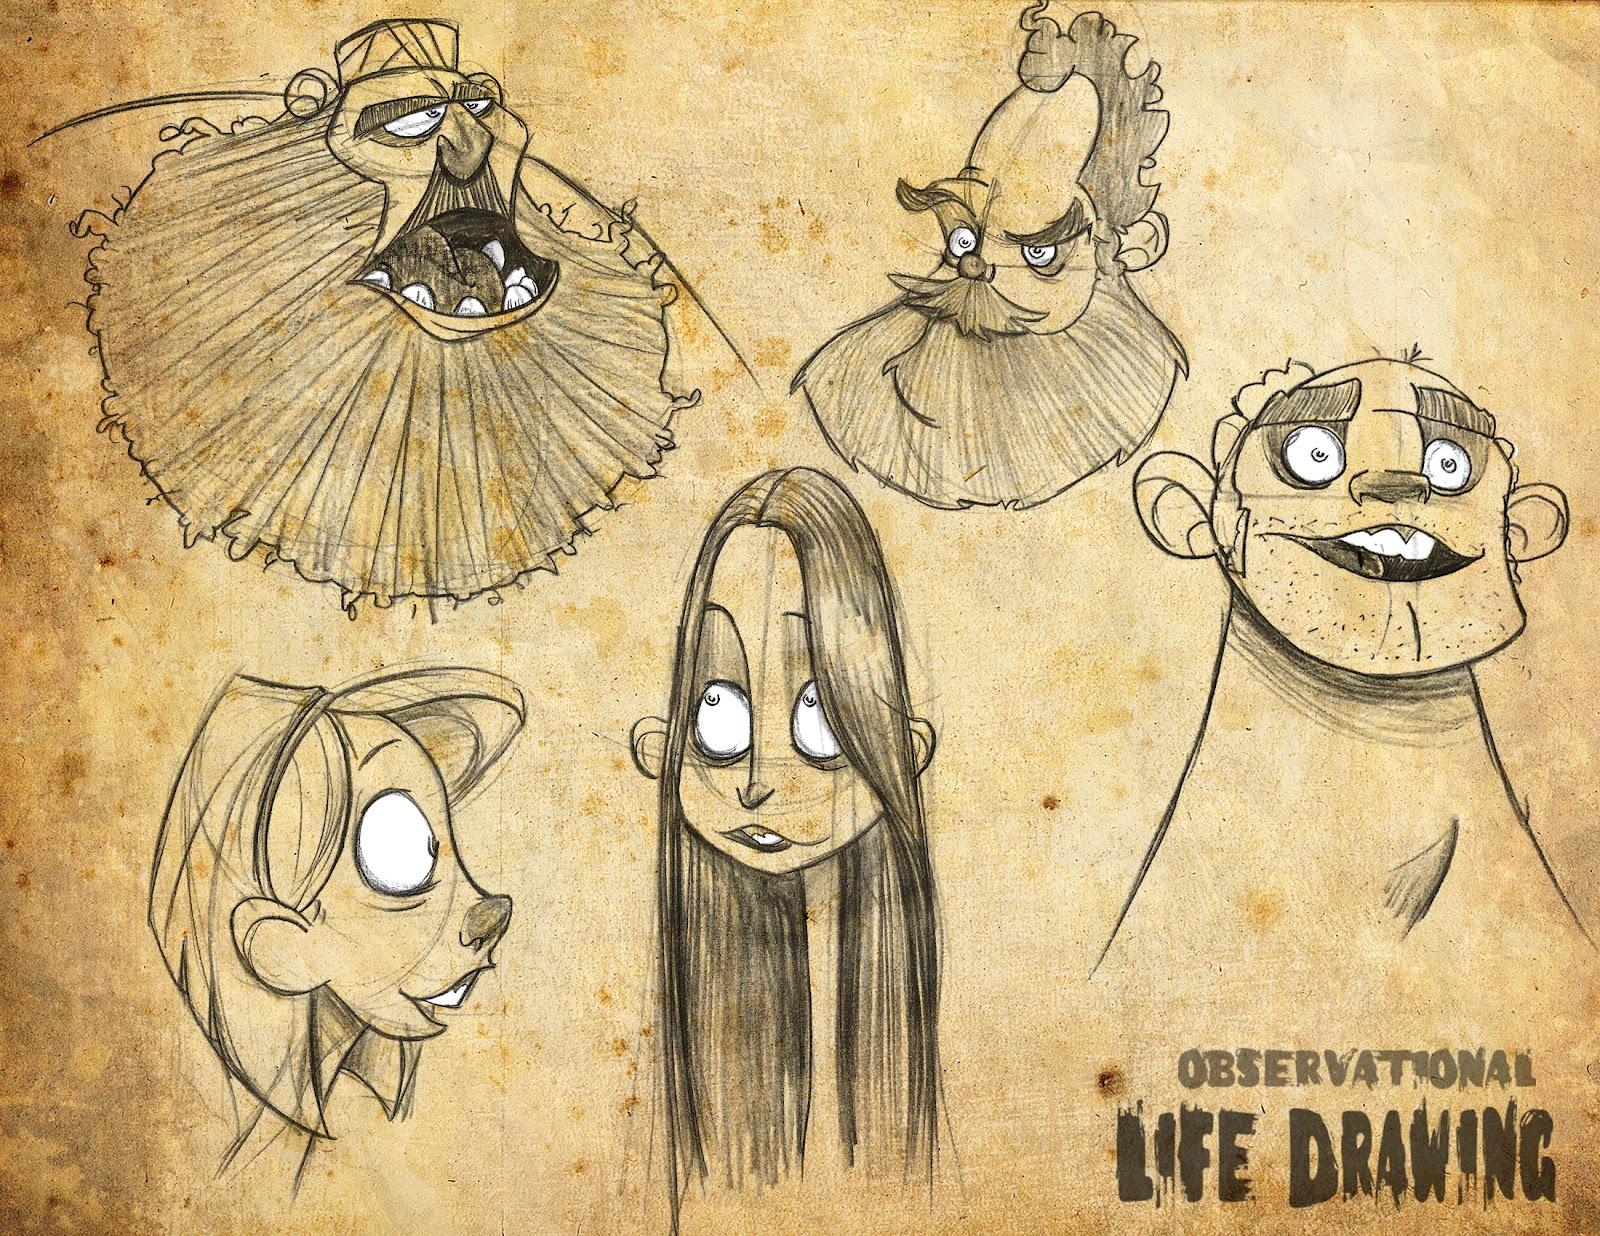 Character Design Life Drawing Pdf : The portfolio of dan seddon life drawing